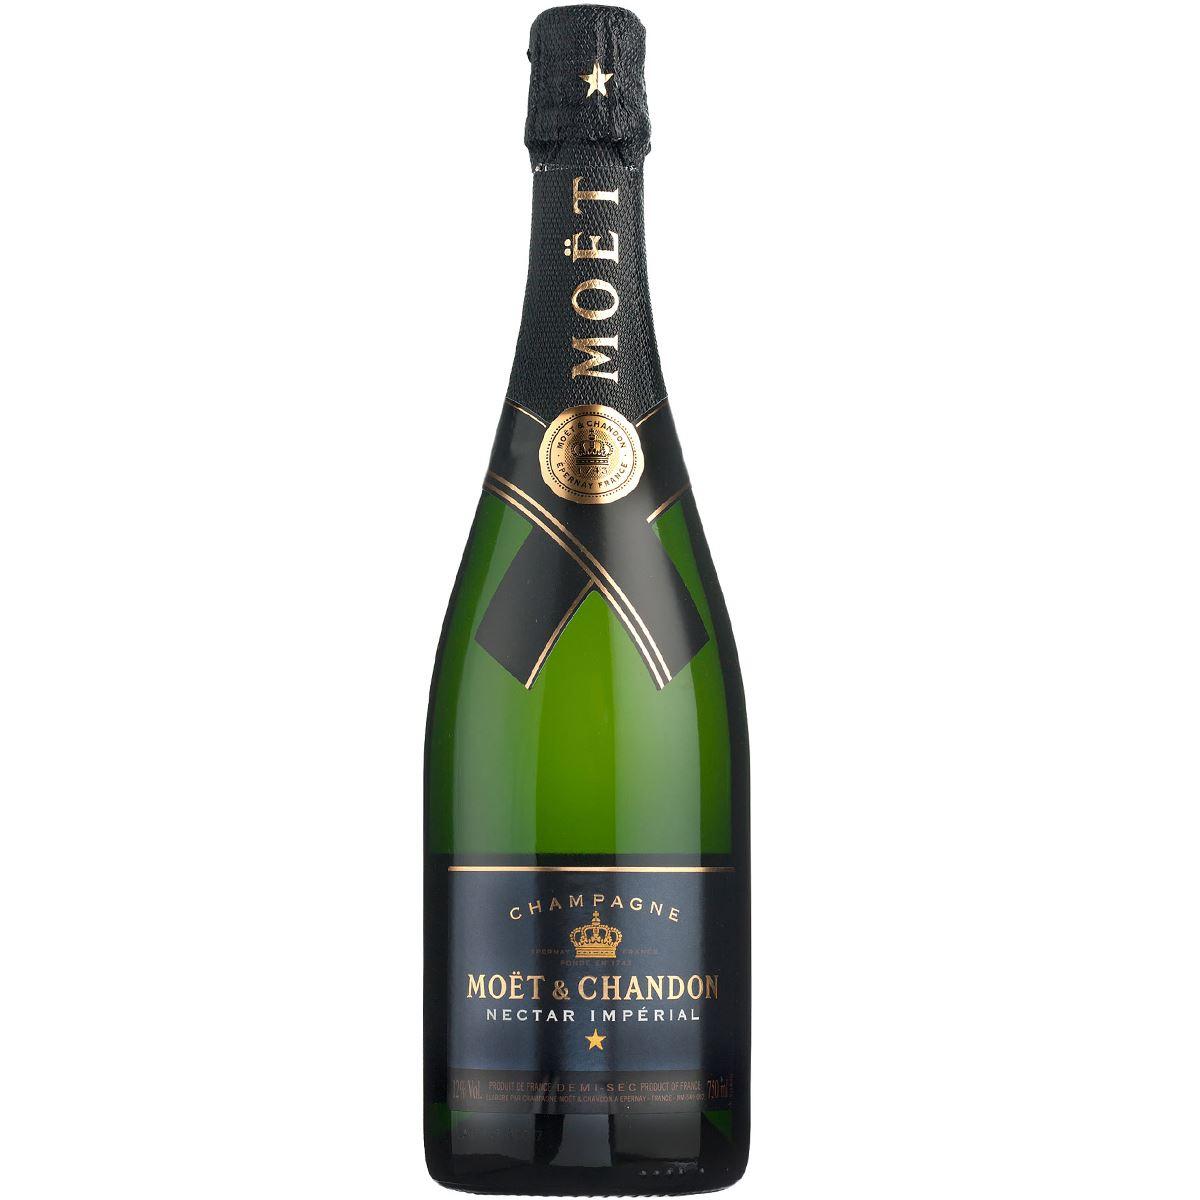 Champagne Doce Moët & Chandon Nectar NV 75cl